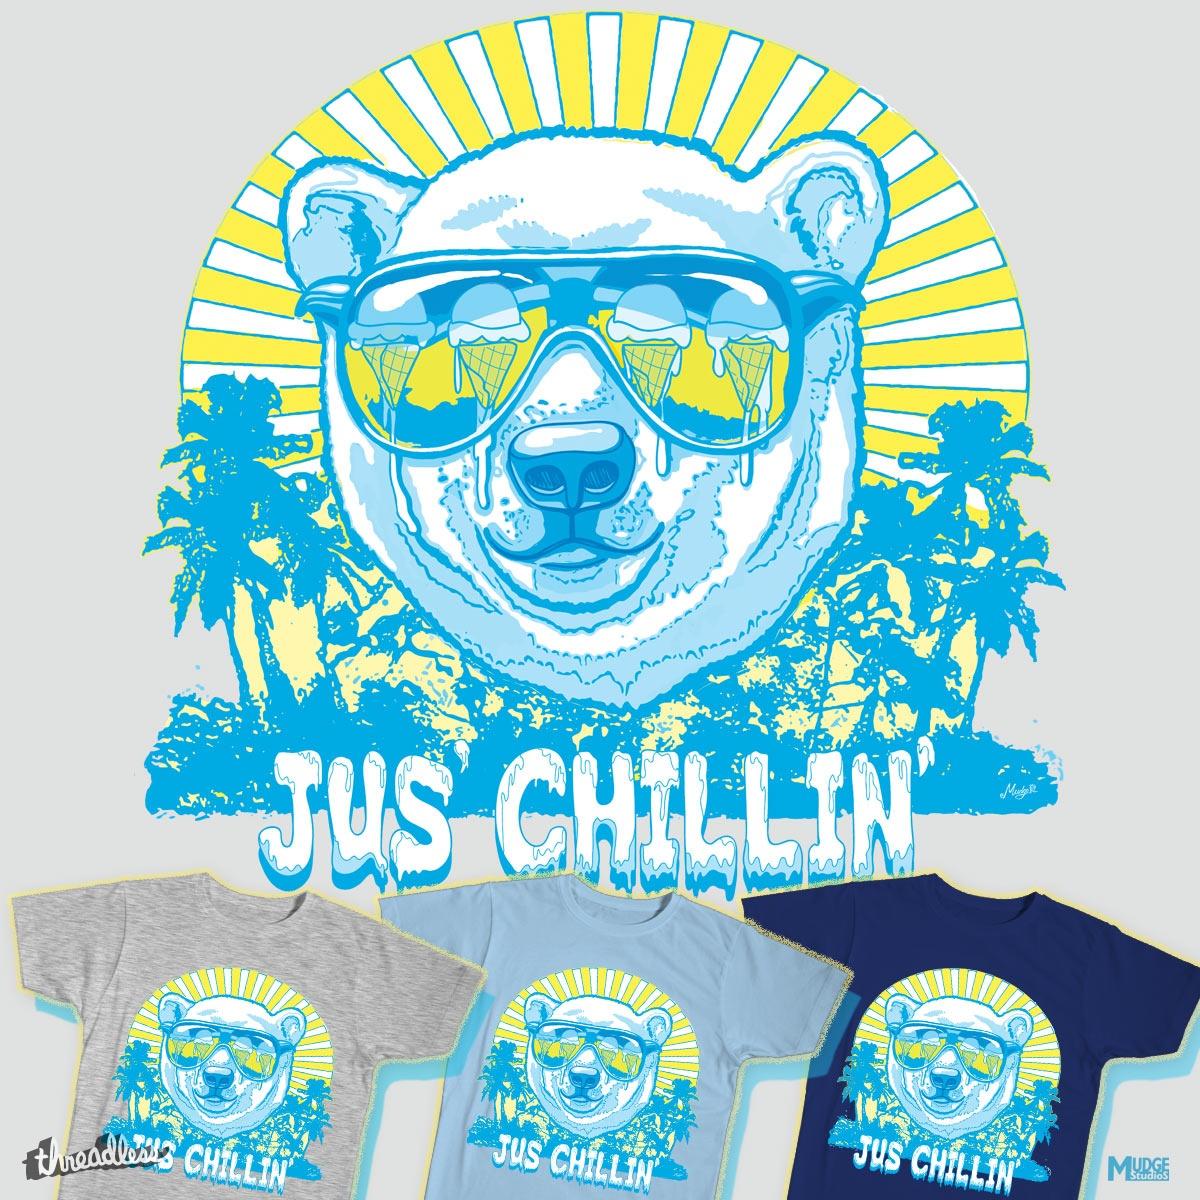 Bear Jus' Chillin' by MudgeStudios on Threadless